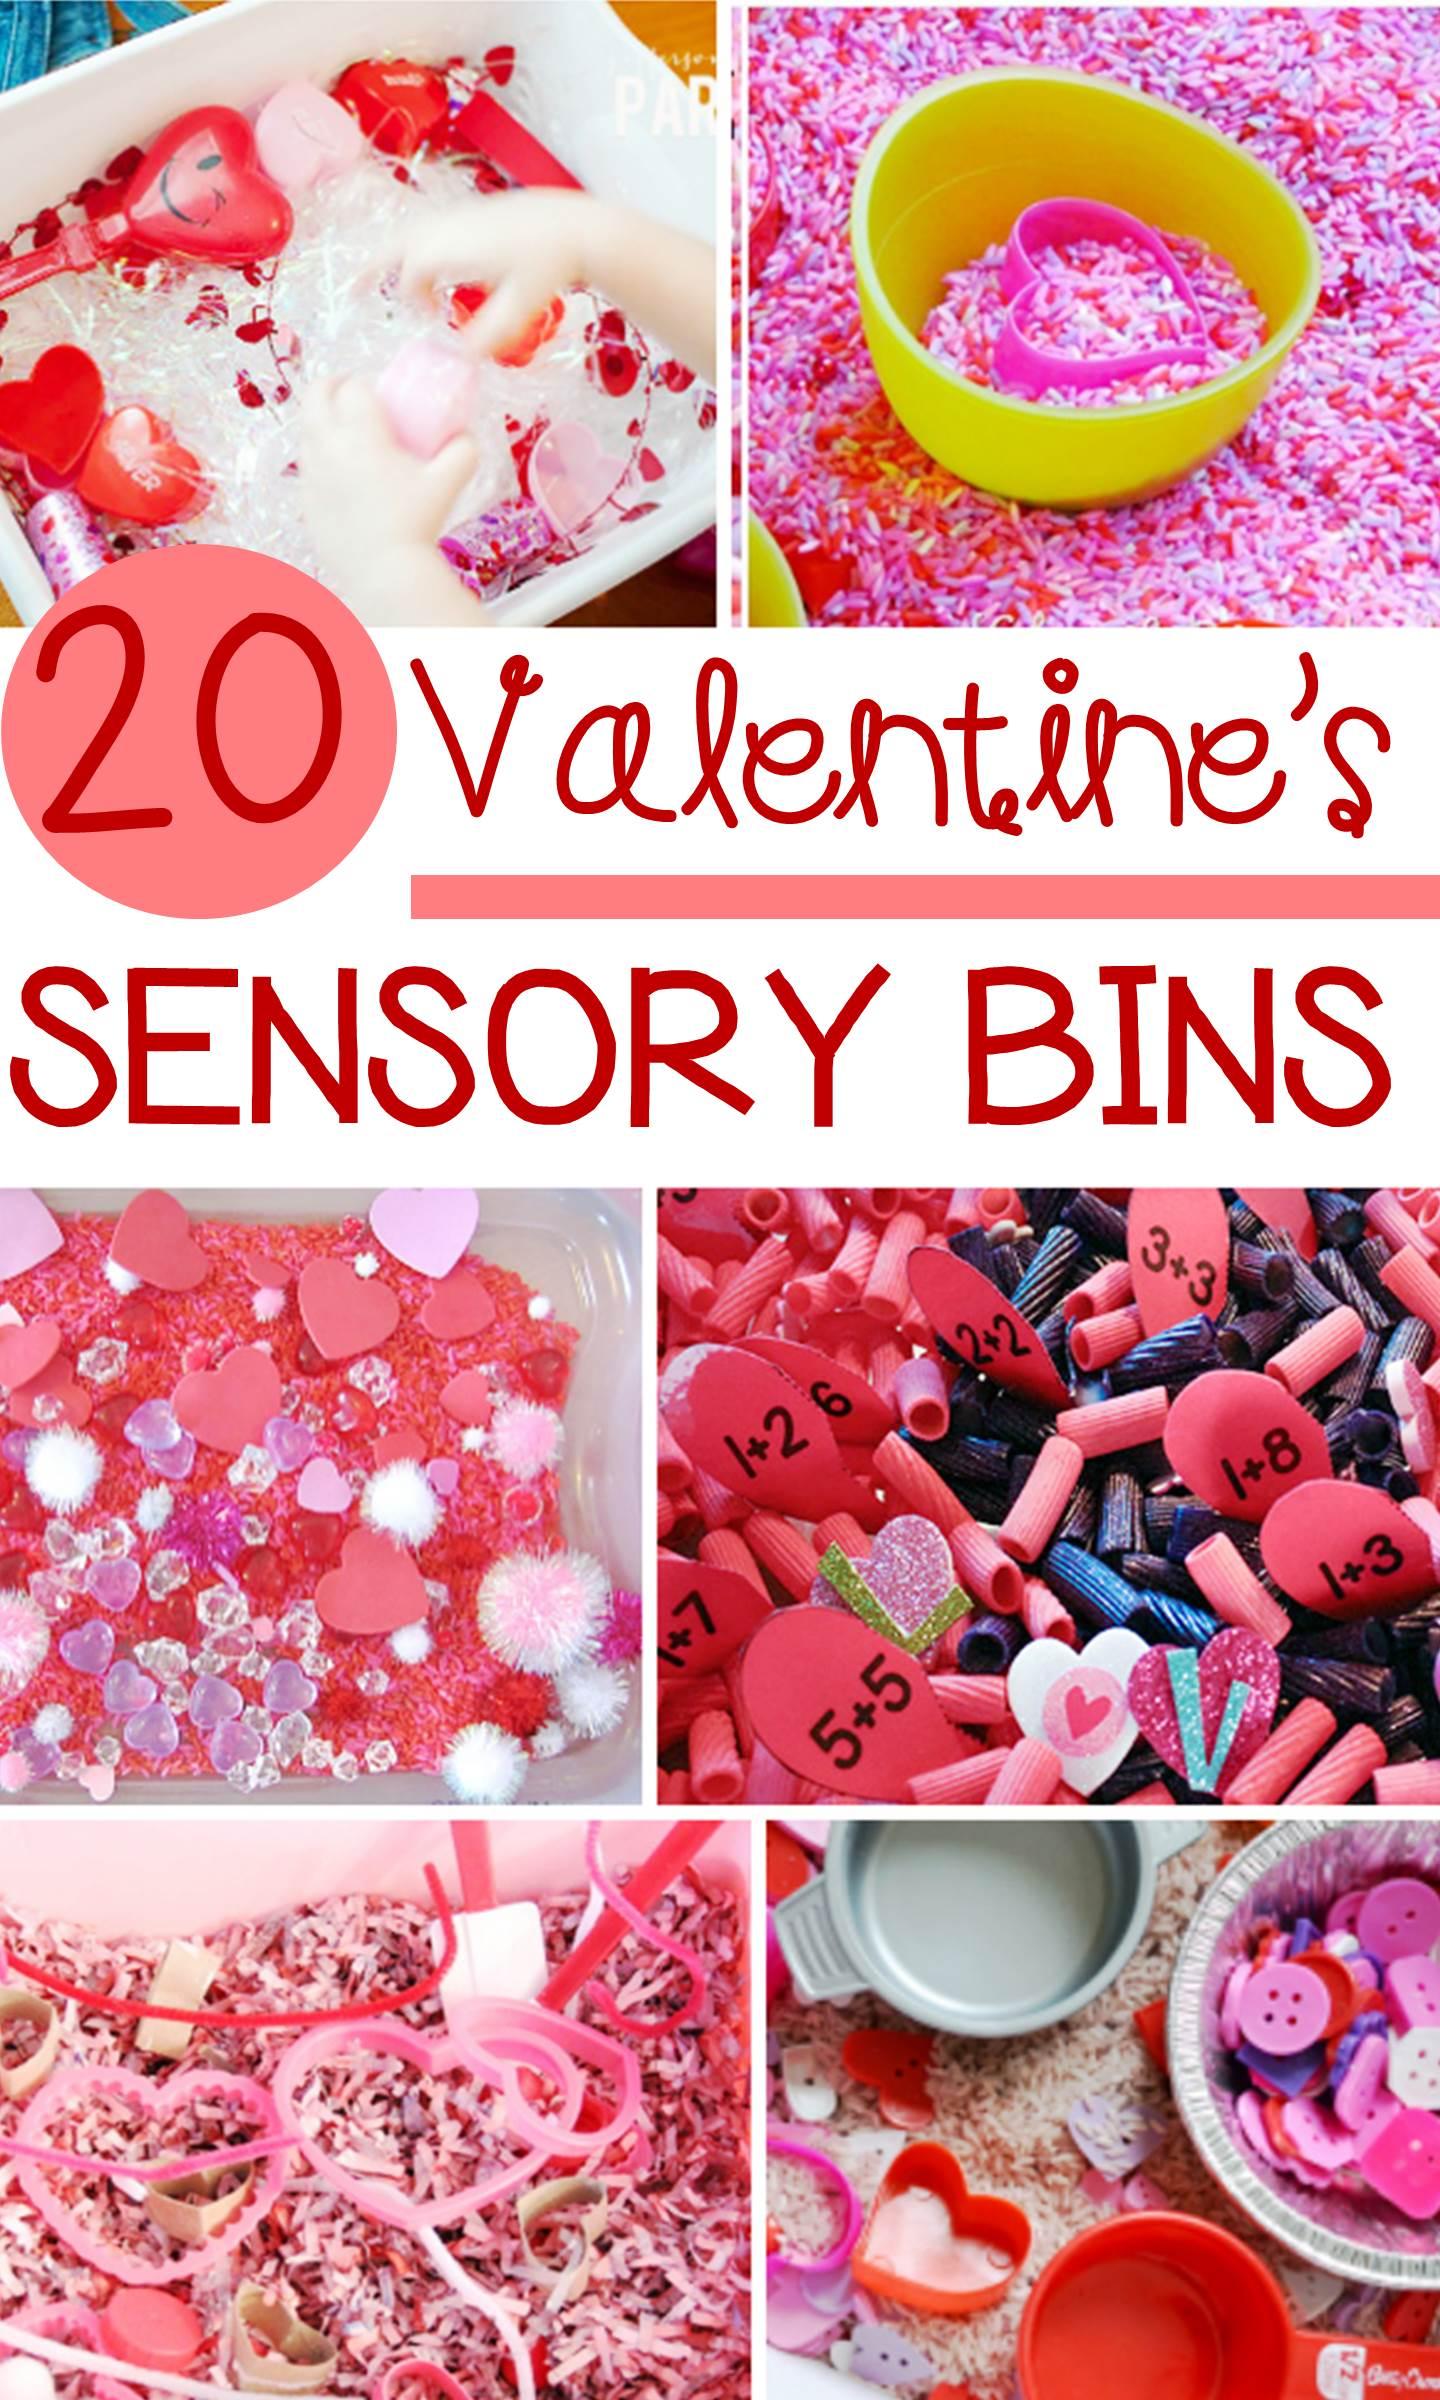 20 Valentine Sensory Bins Kids Will Love for Pre-K and Kindergarten!